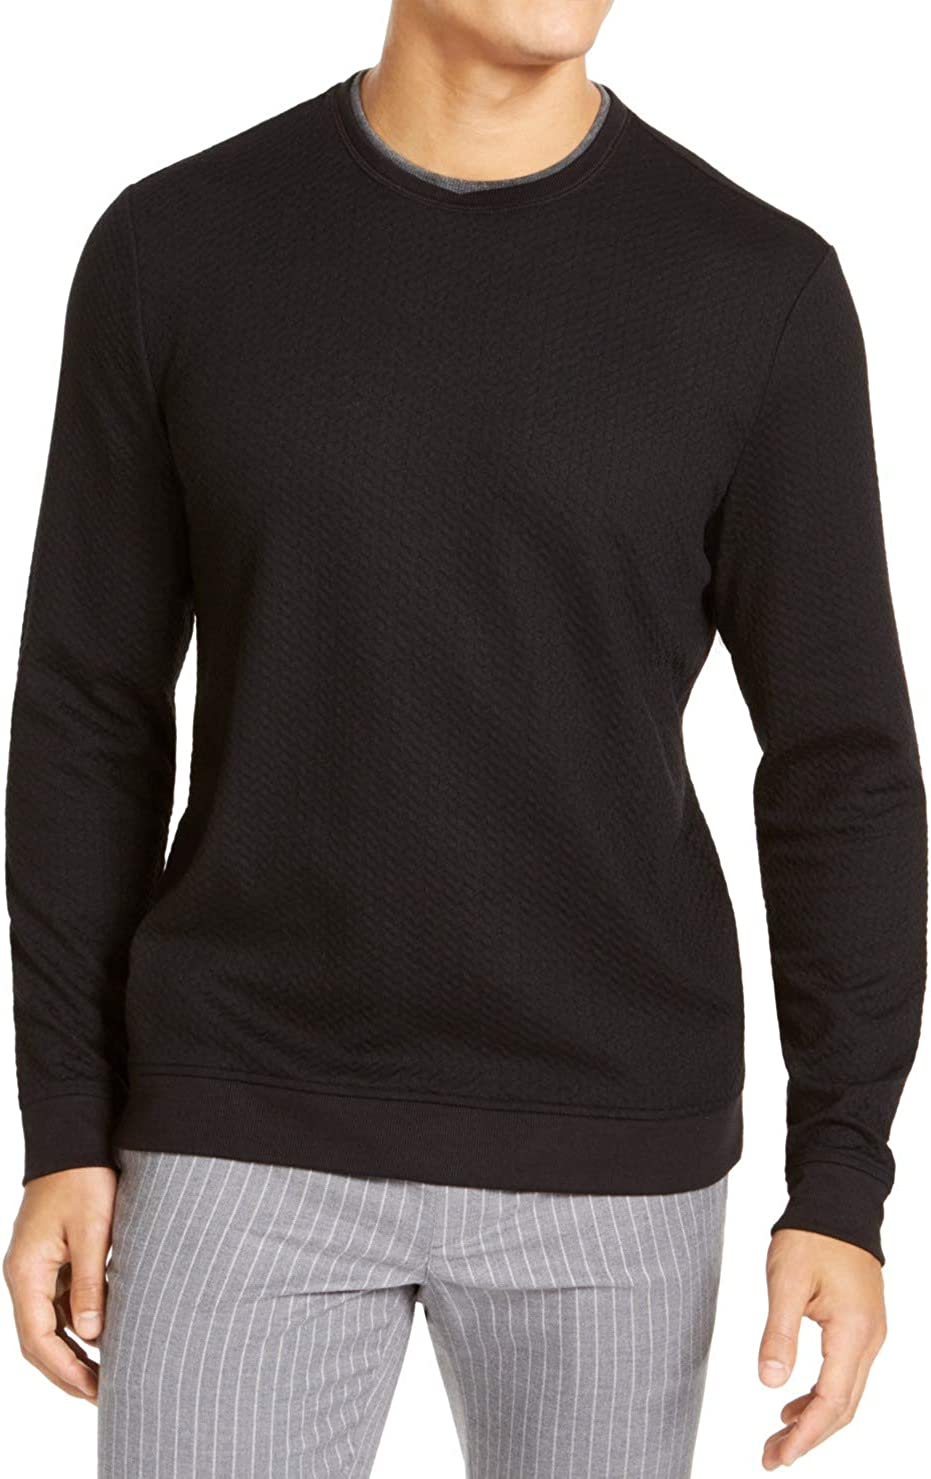 Tasso Elba Mens Sweater Crewneck Pullover Knit Solid Black 2XL